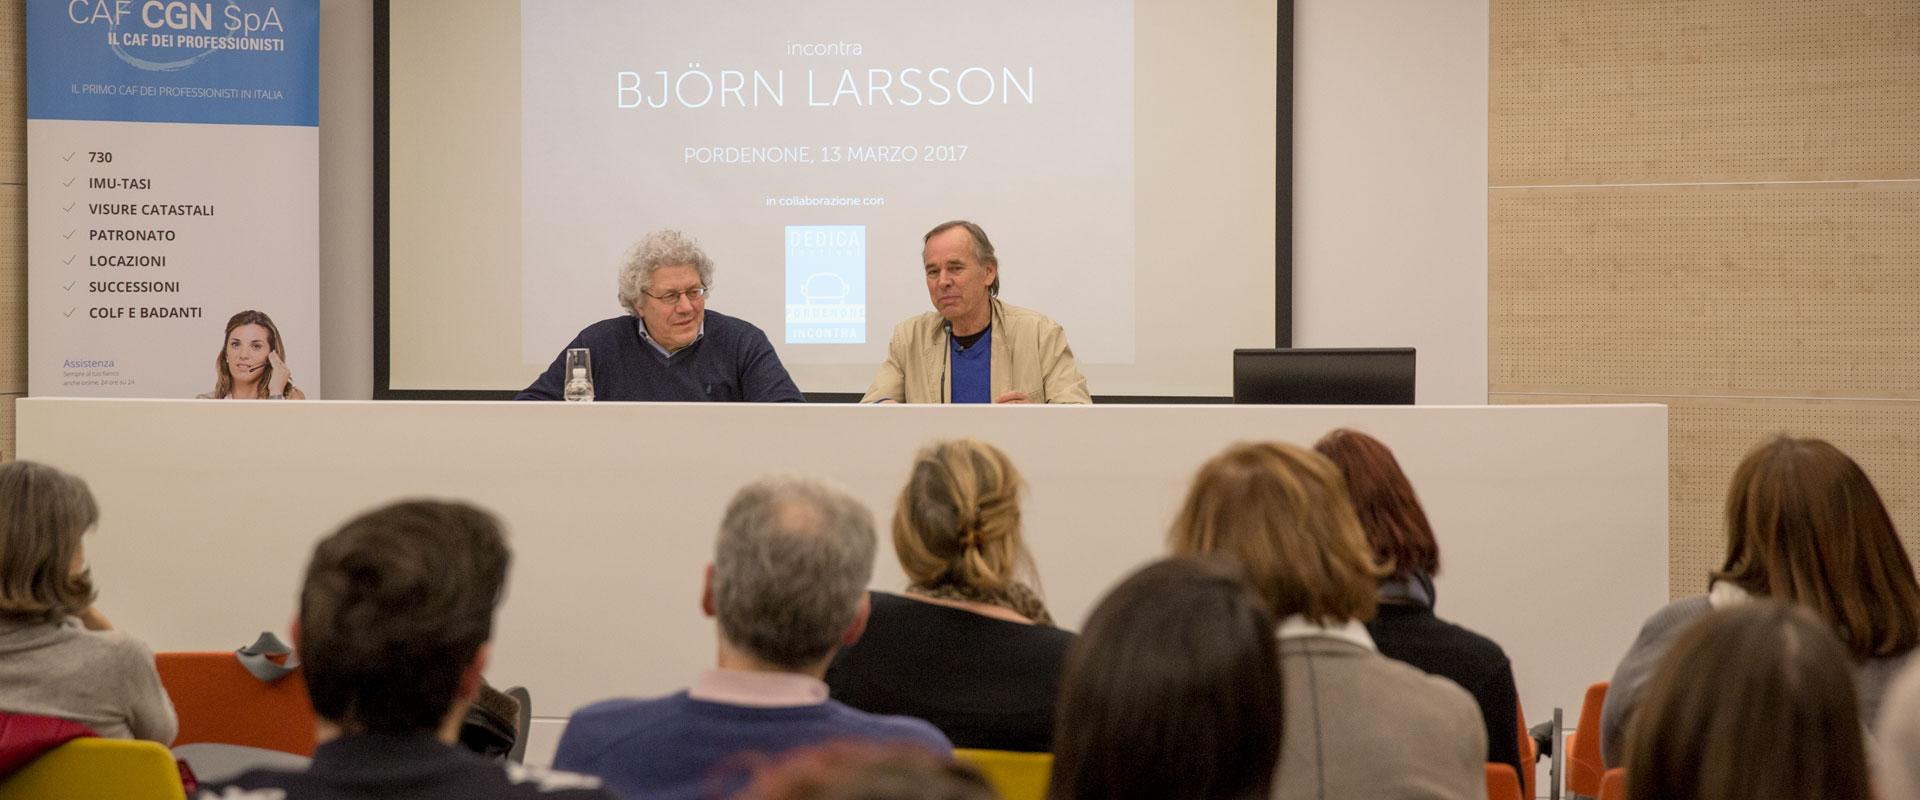 Bjorn Larsson incontra CGN